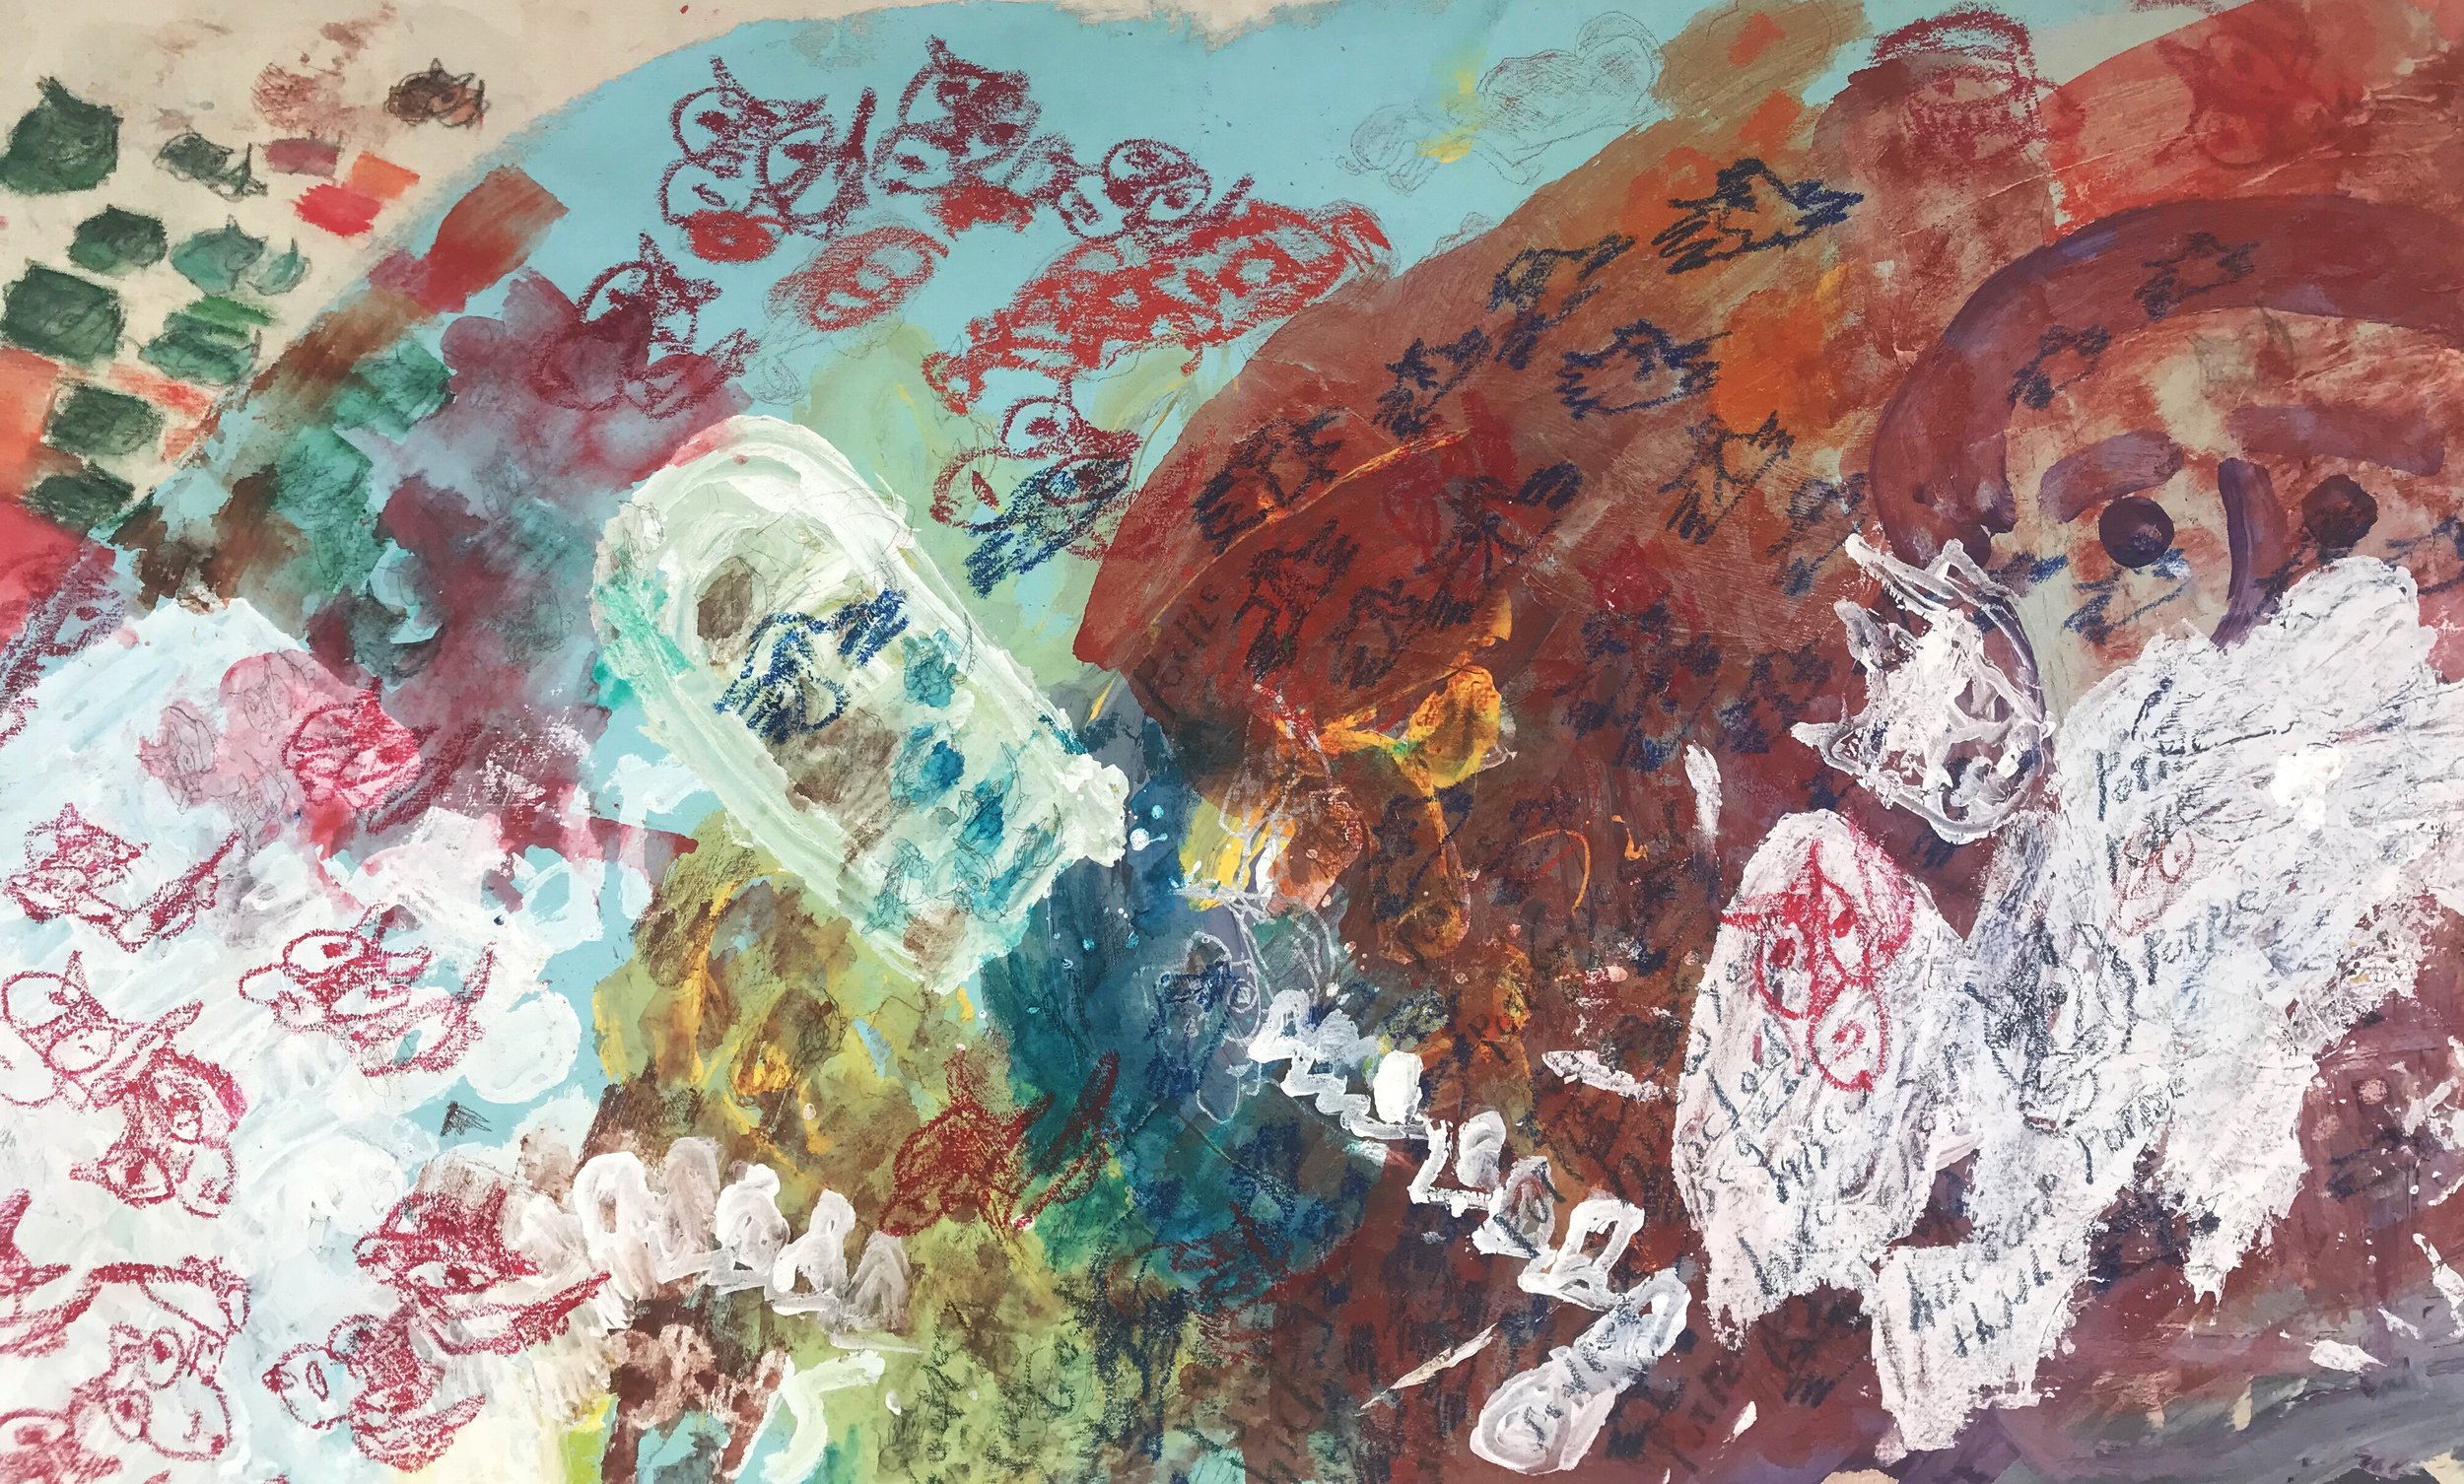 Selected Works by John Montedoro   April 19 - June 14, 2018